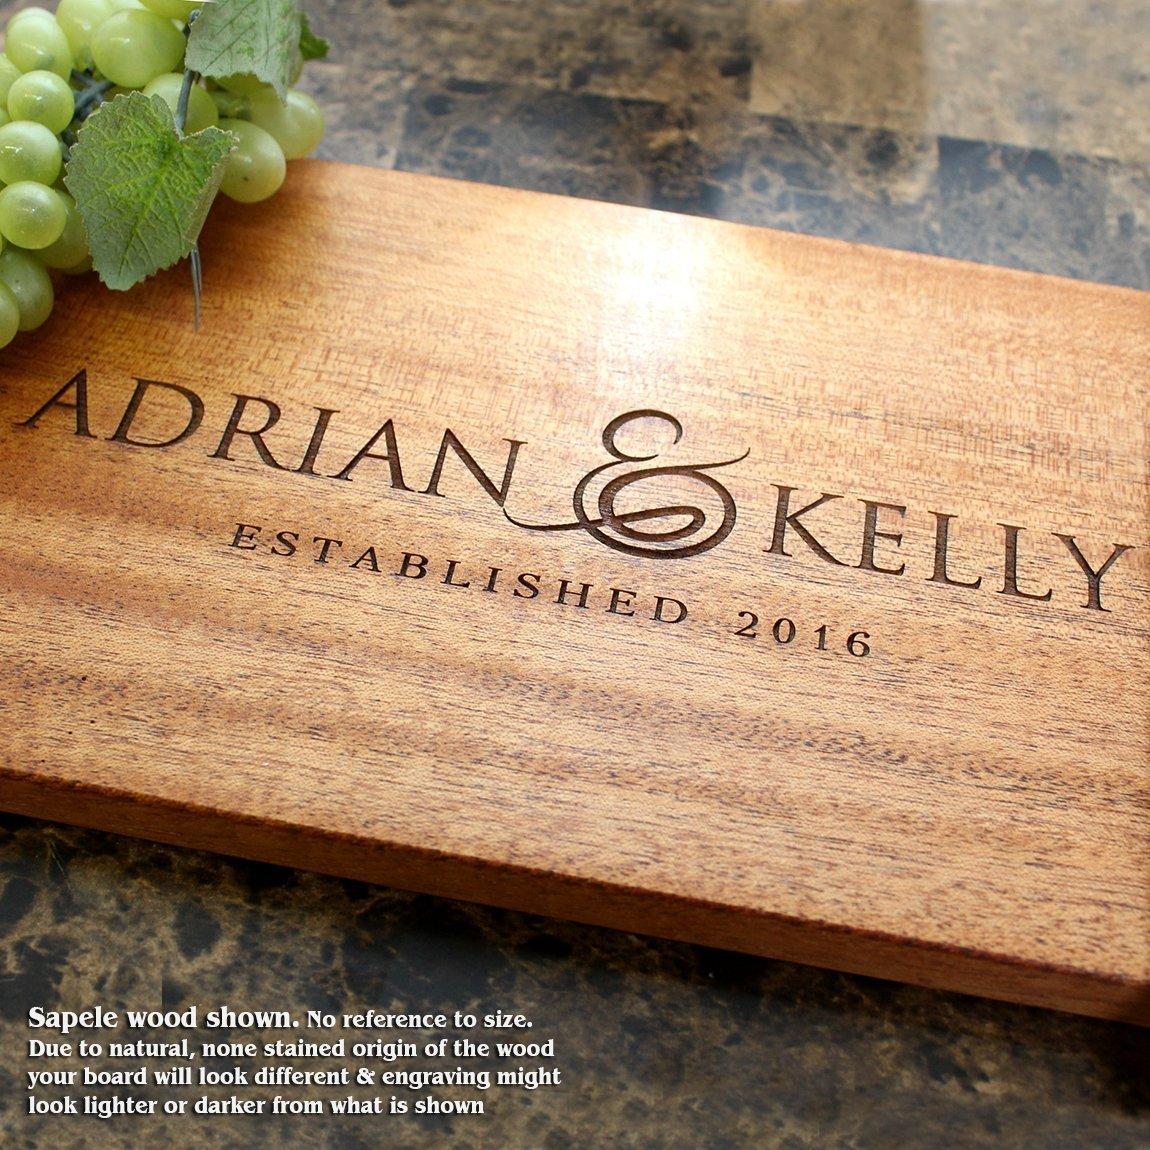 Personalized Cutting Board, Custom Keepsake, Engraved Serving Cheese Plate, Wedding, Anniversary, Engagement, Housewarming, Birthday, Corporate, Closing Gift #216